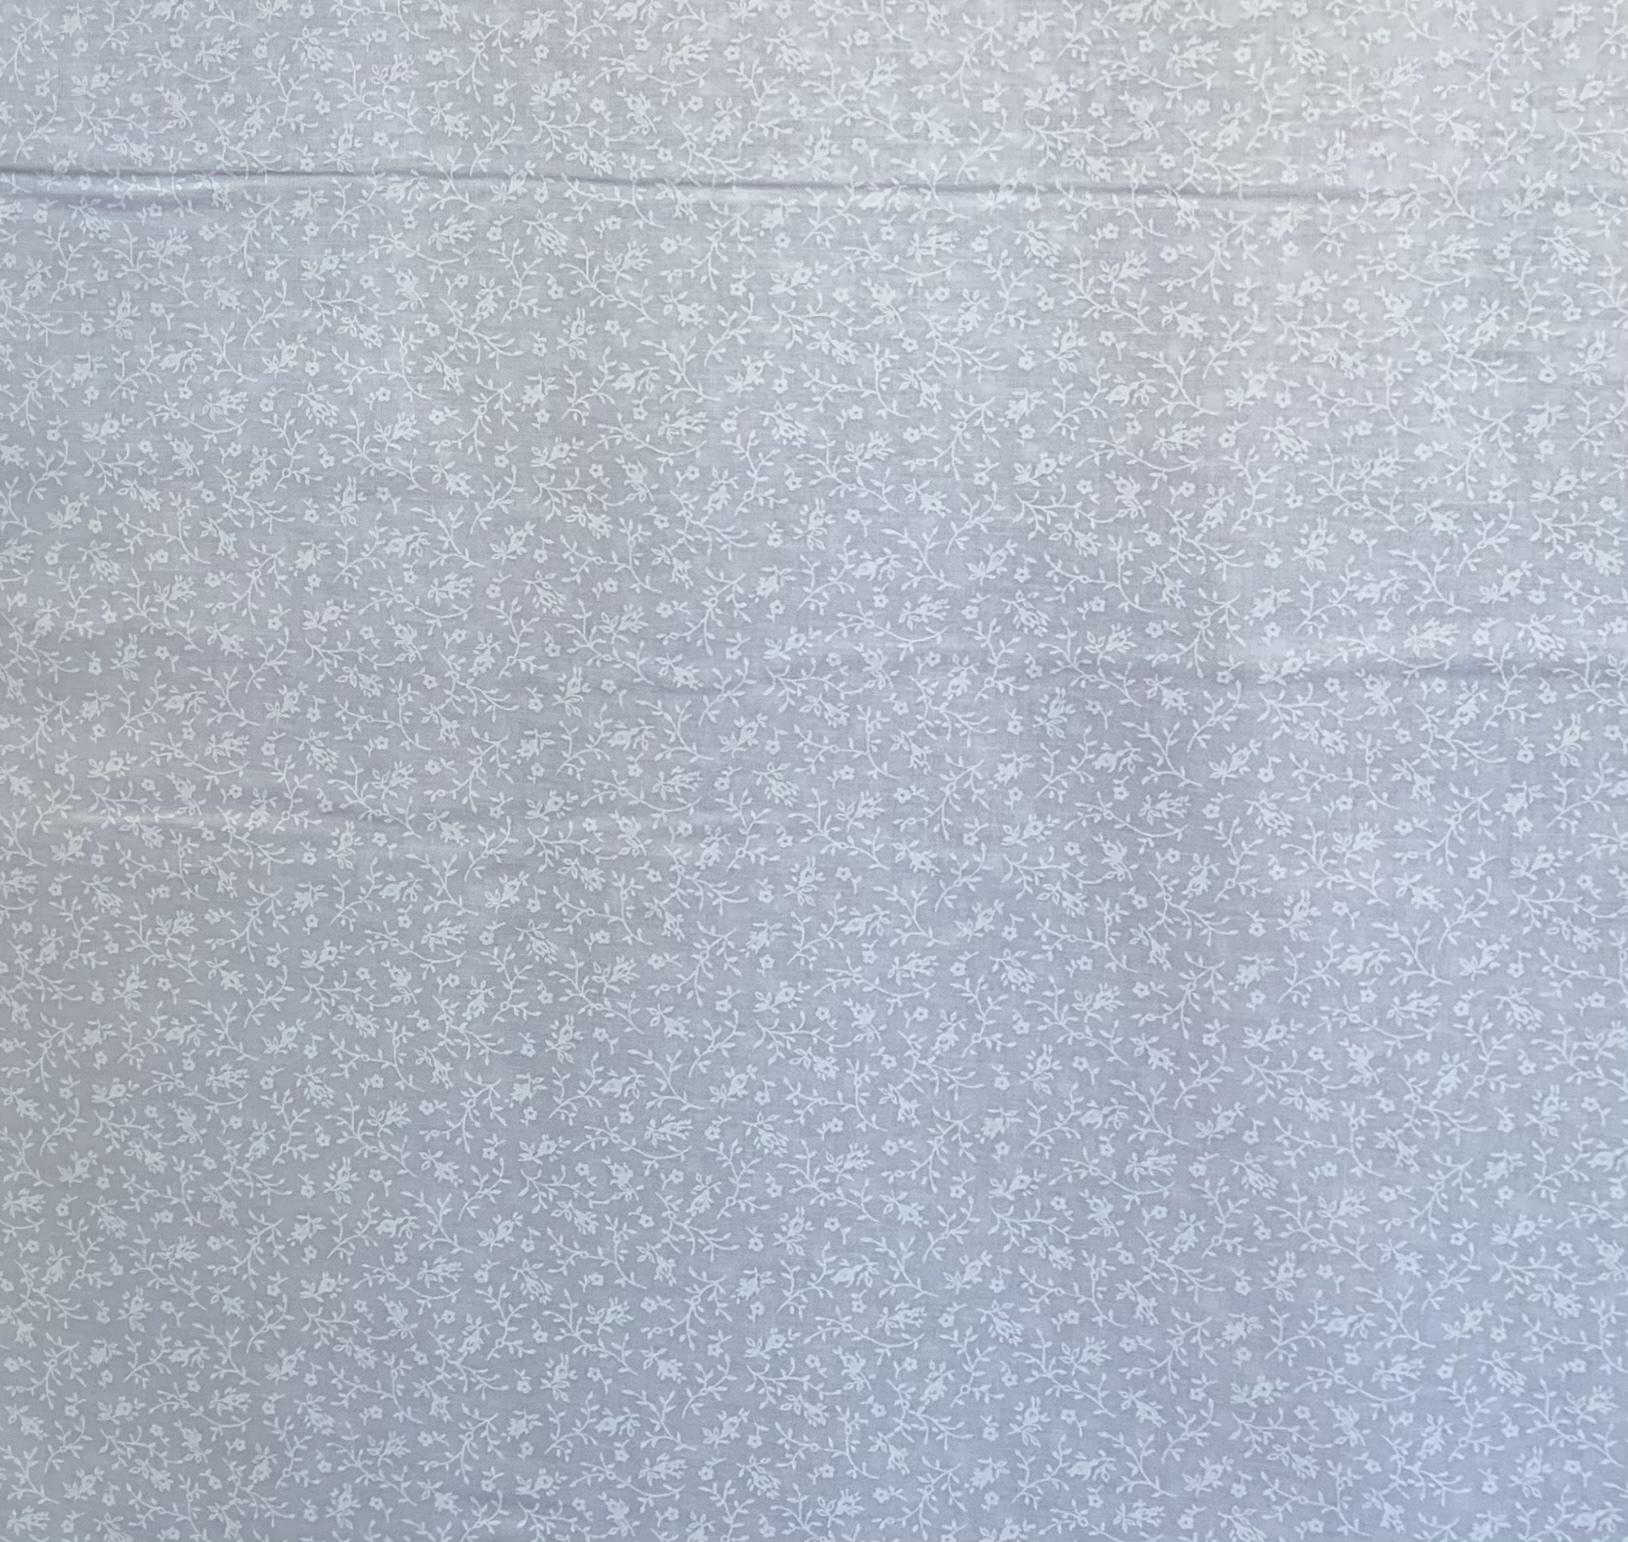 White Tone on Tone - Big Flowers - 1/2m cut 57715